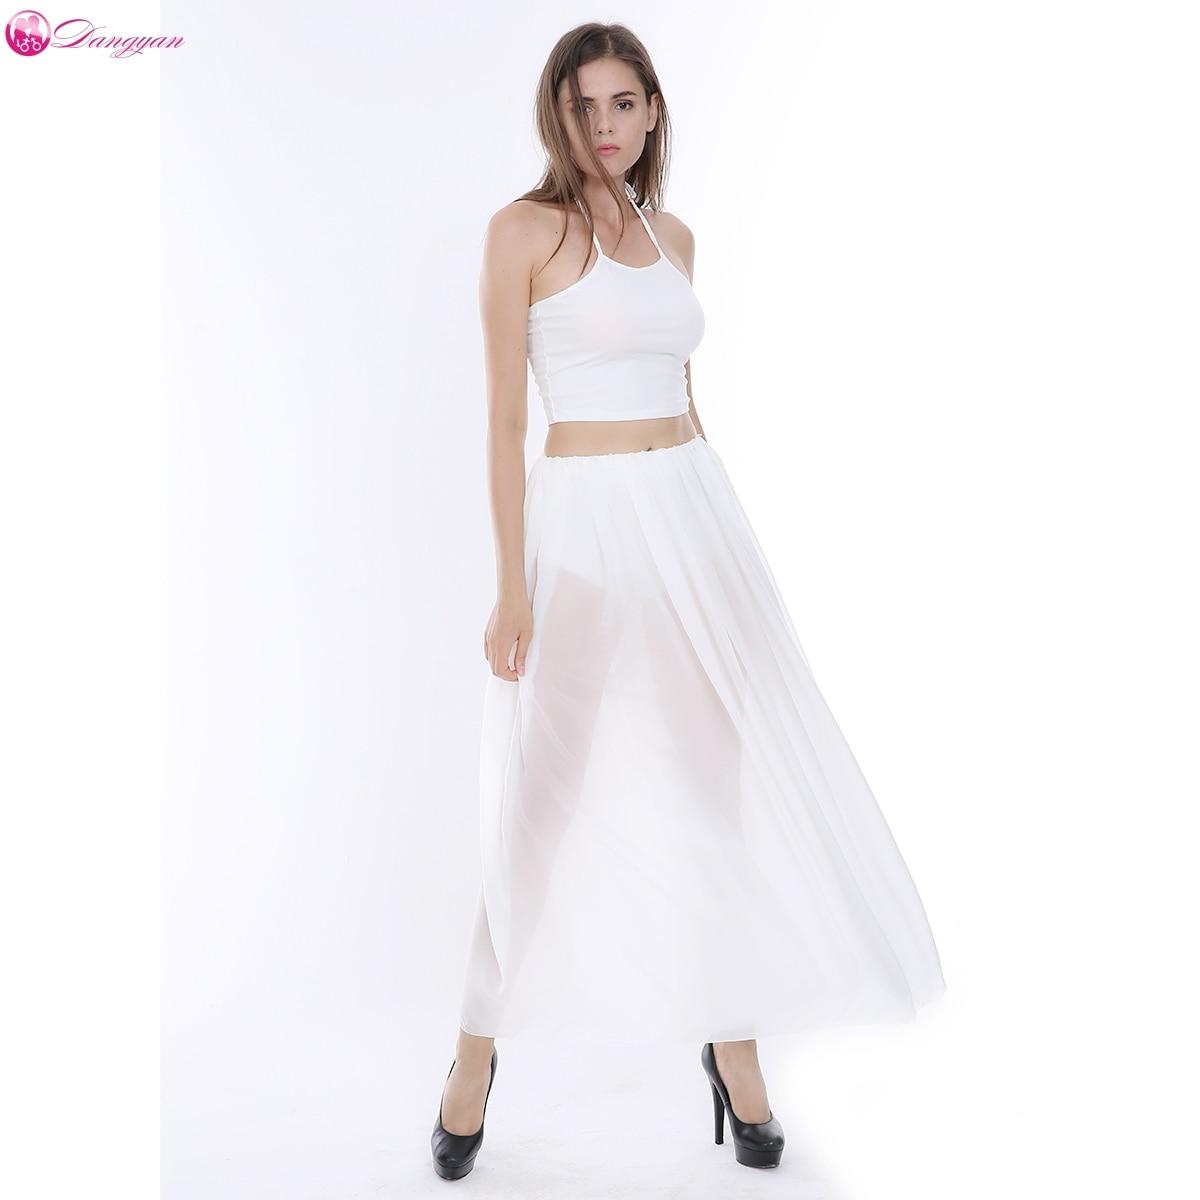 DangYan 2017 Summer Dress Womens two pieces Sexy Dresses Party Night Club Dress Chiffon Halter White Women Vestidos